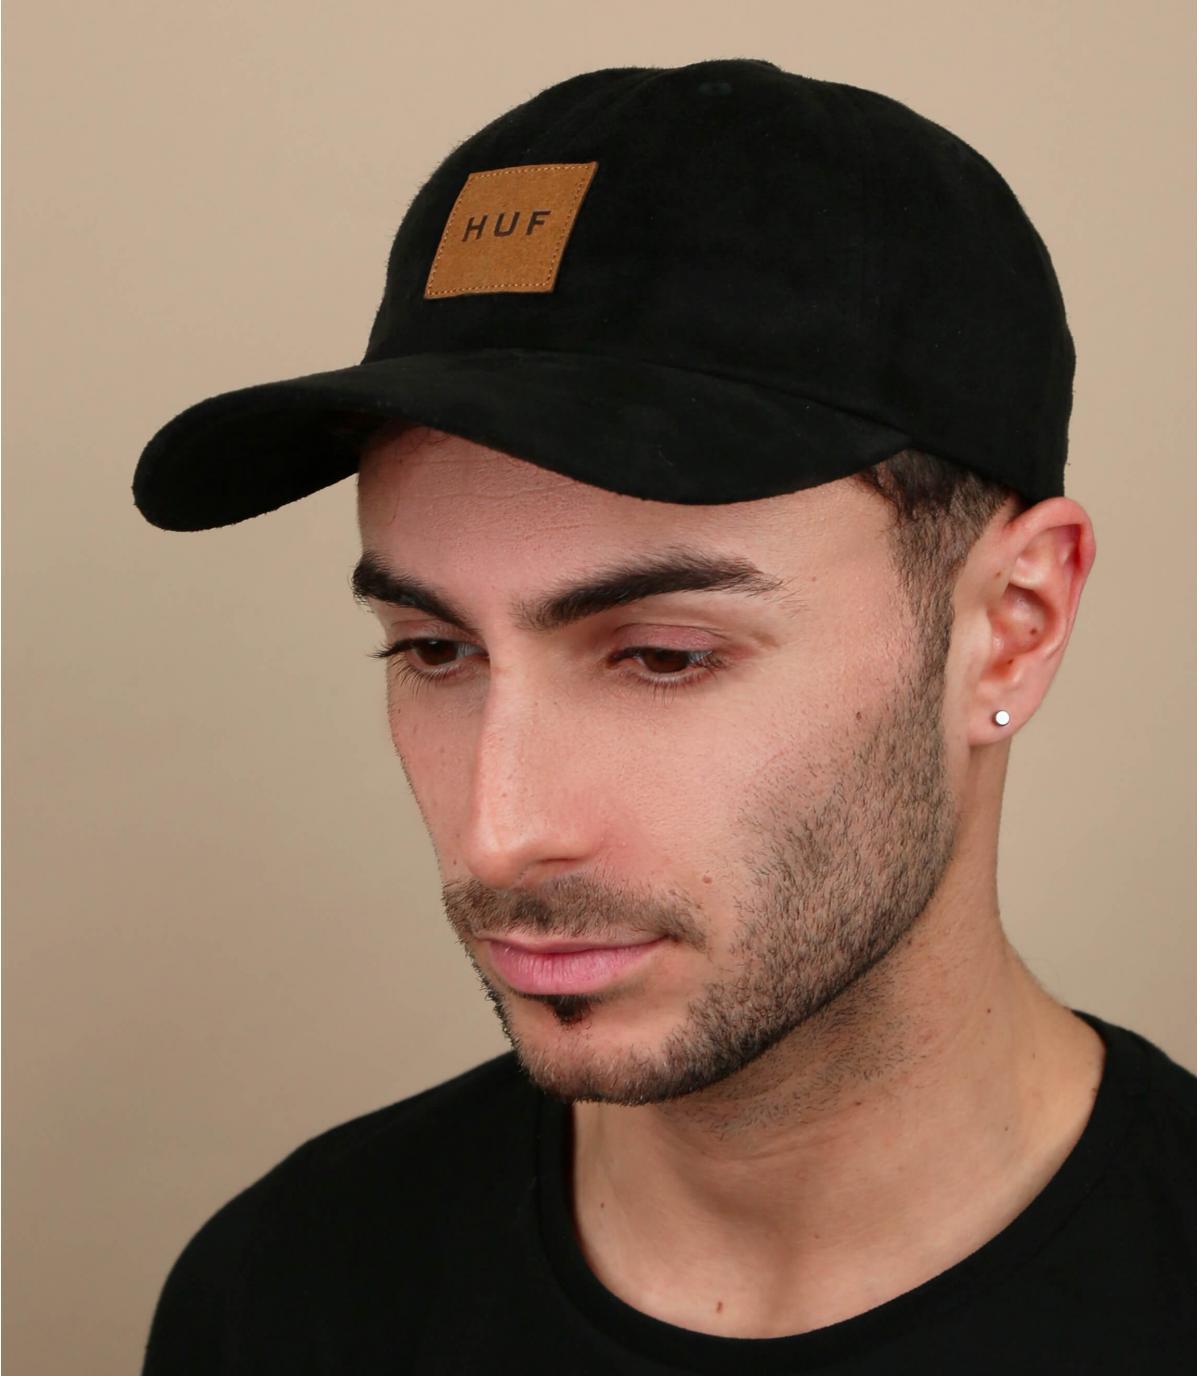 casquette Huf noir suede